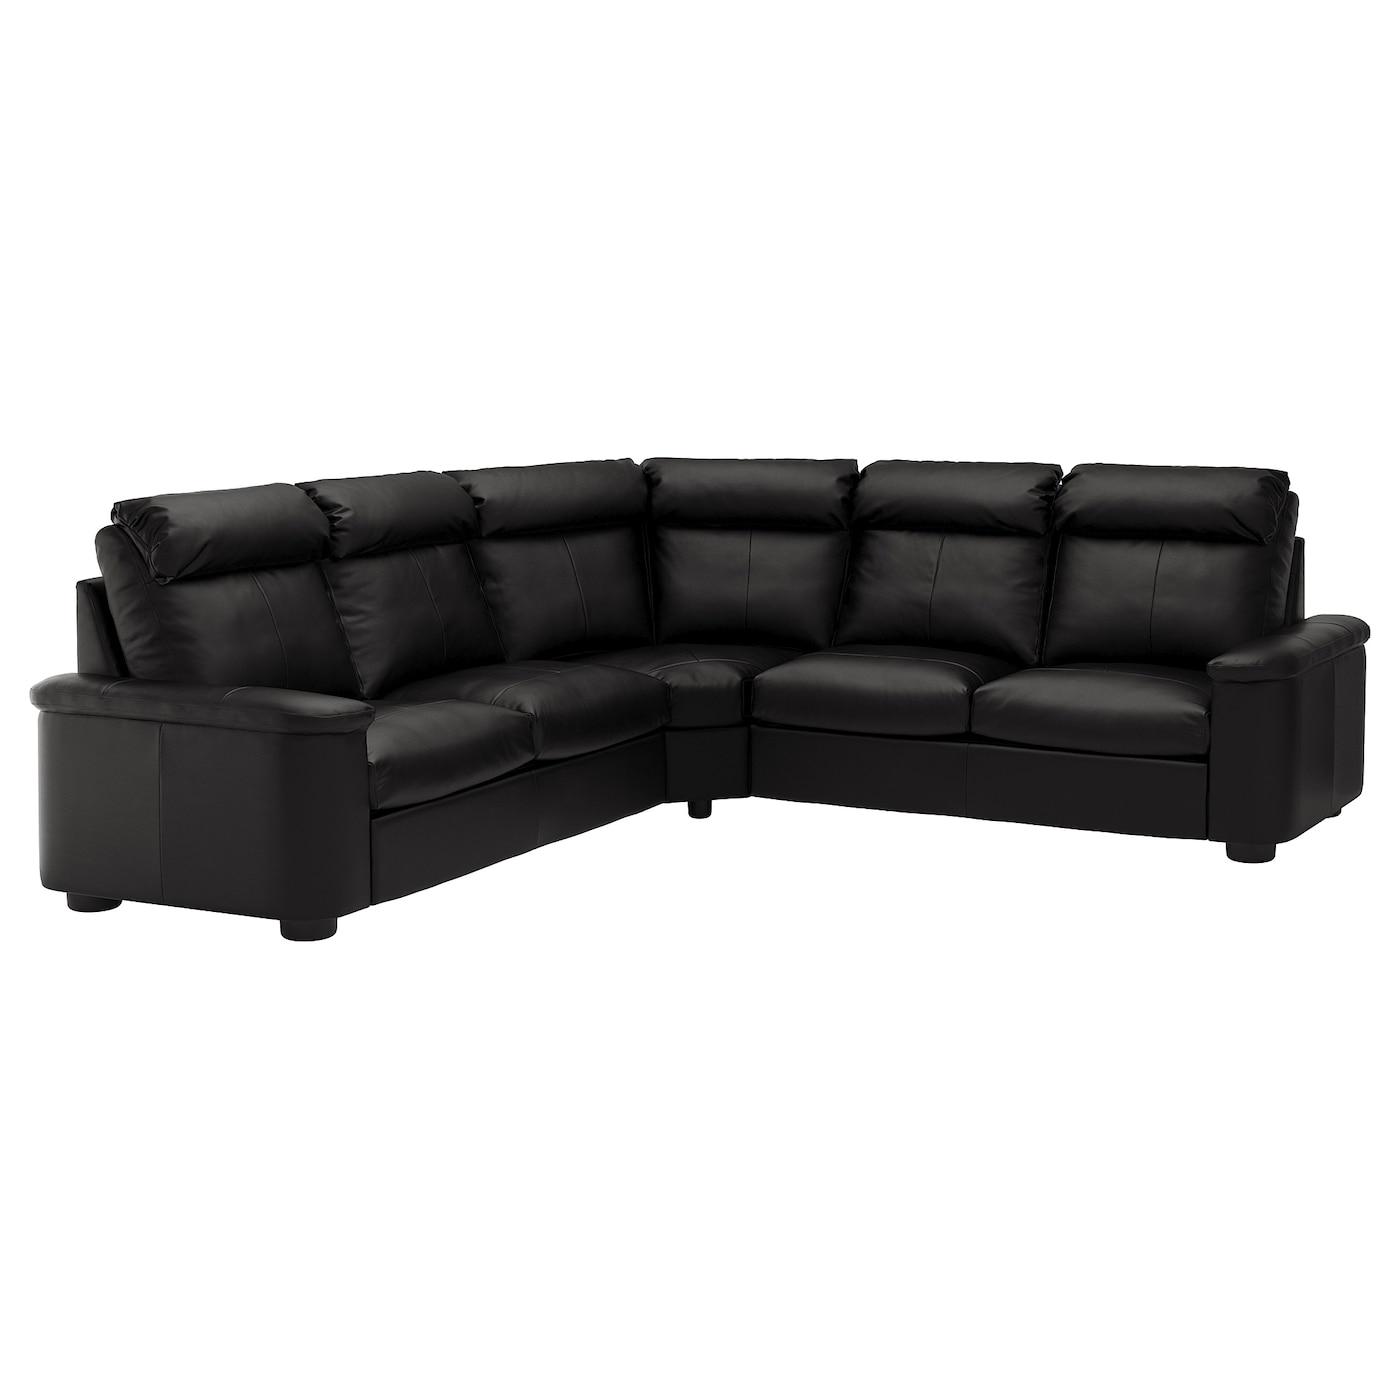 Corner Sofa Bed 5 Seat Lidhult Grannbomstad Black in dimensions 1400 X 1400